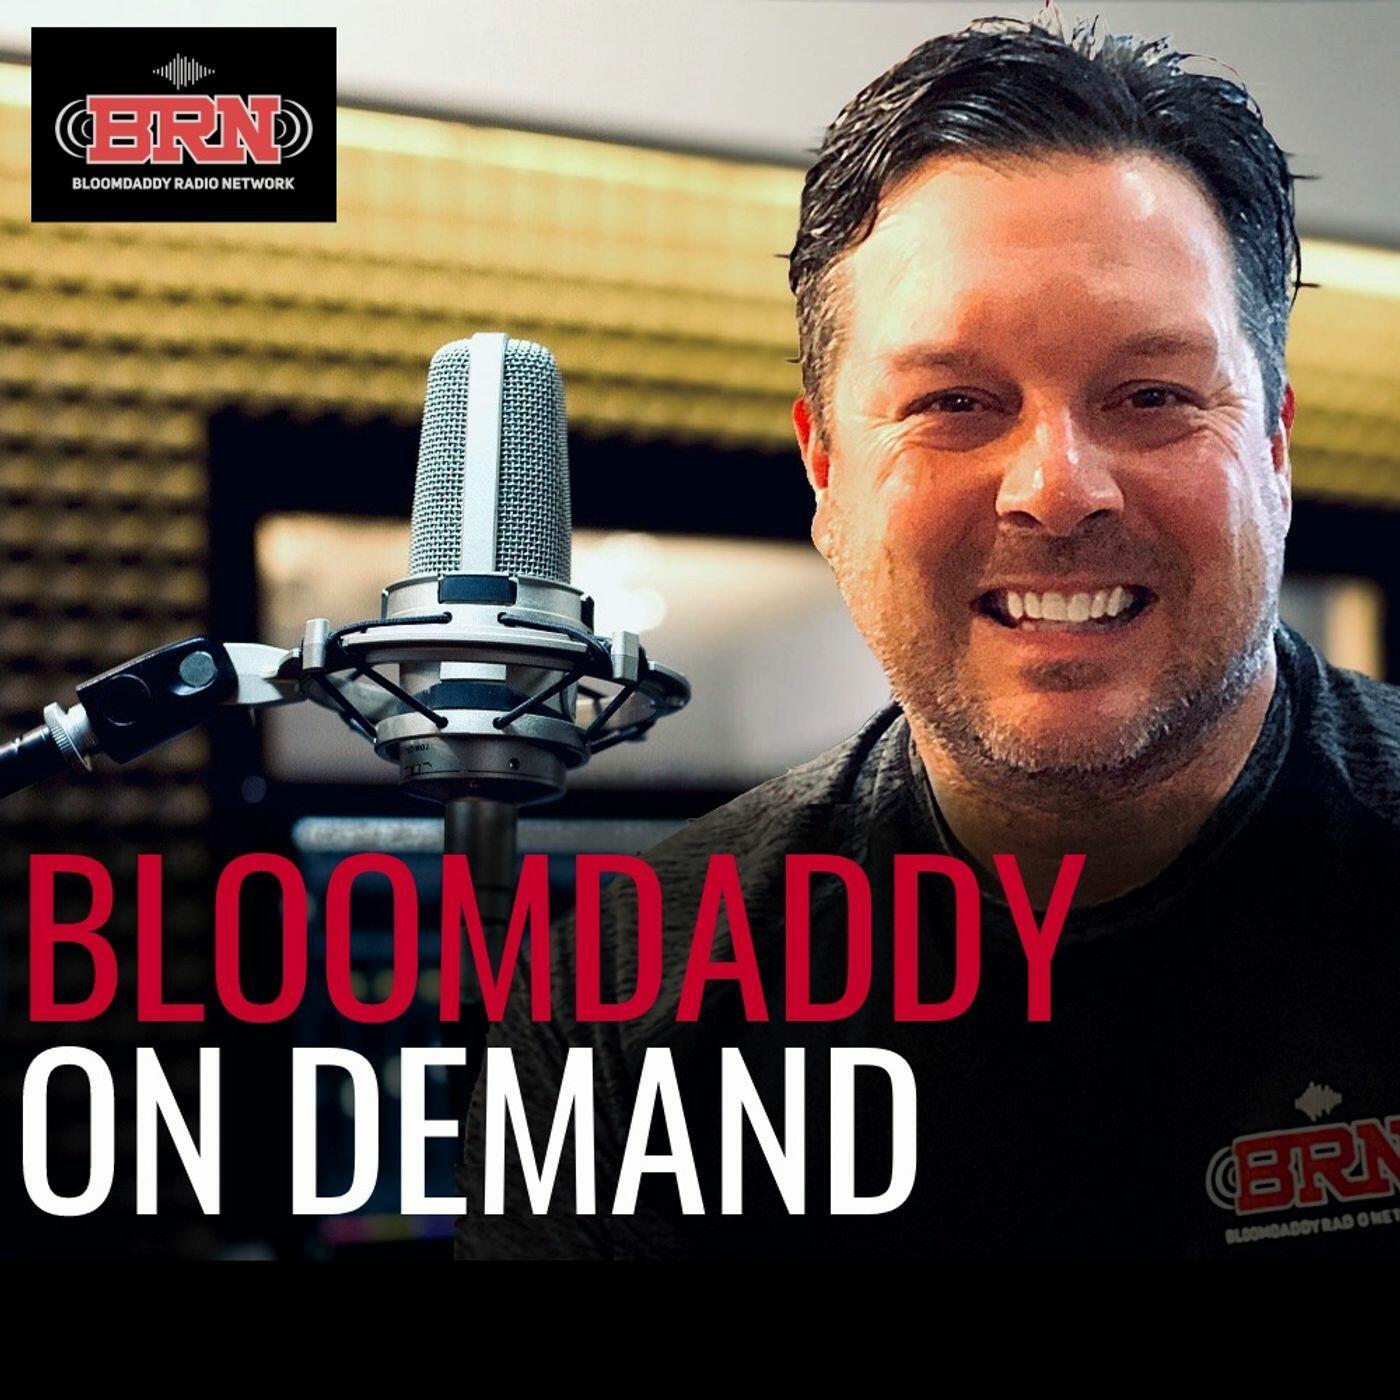 Bloomdaddy On Demand